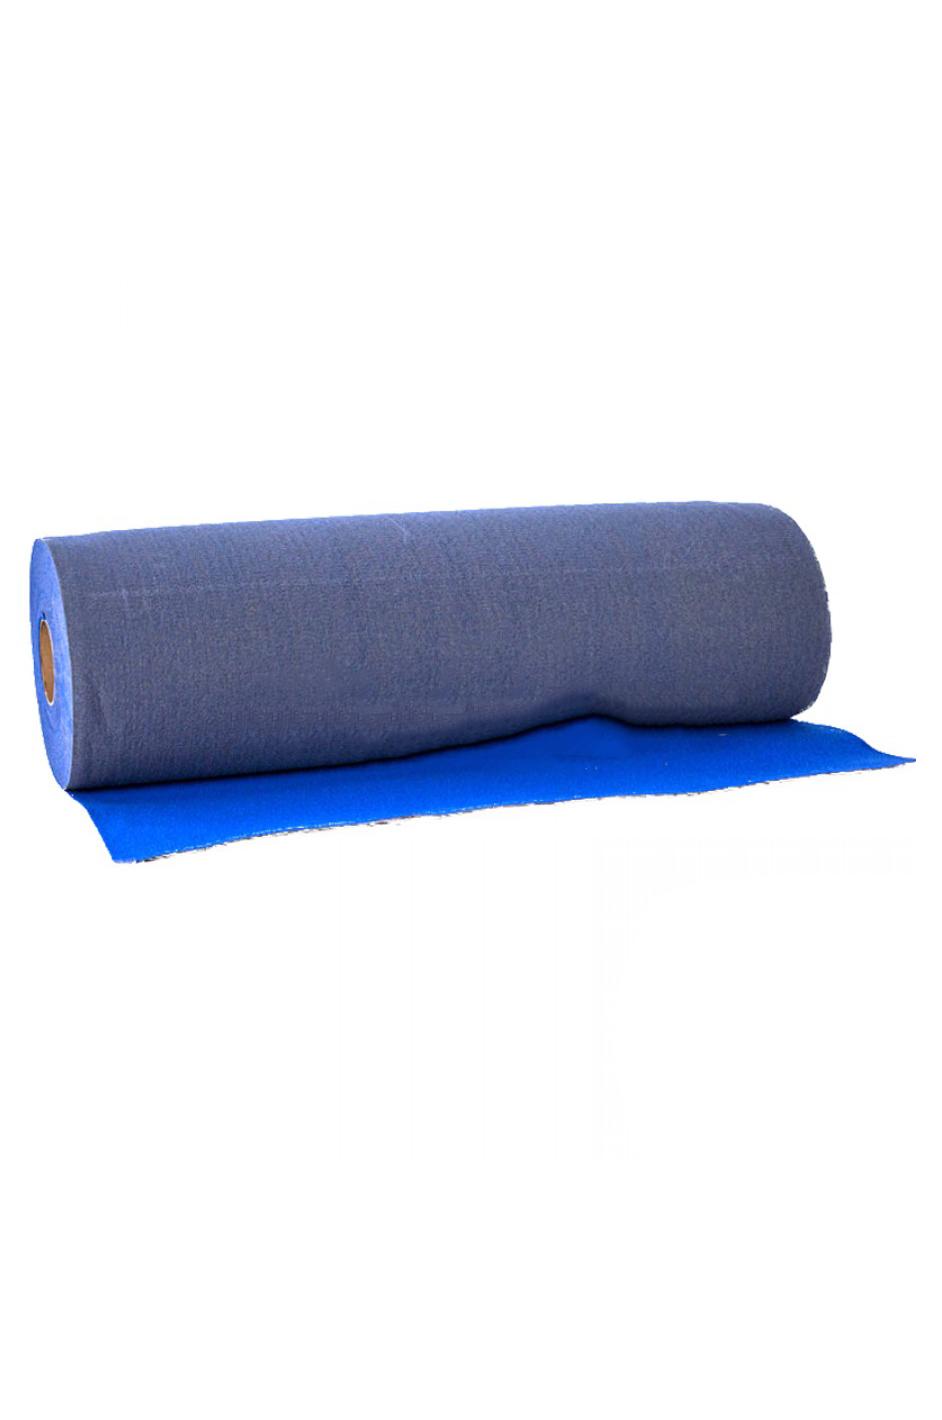 Tappeto da cerimonia blu senza pellicola h. 1 mt x l. 30 mt